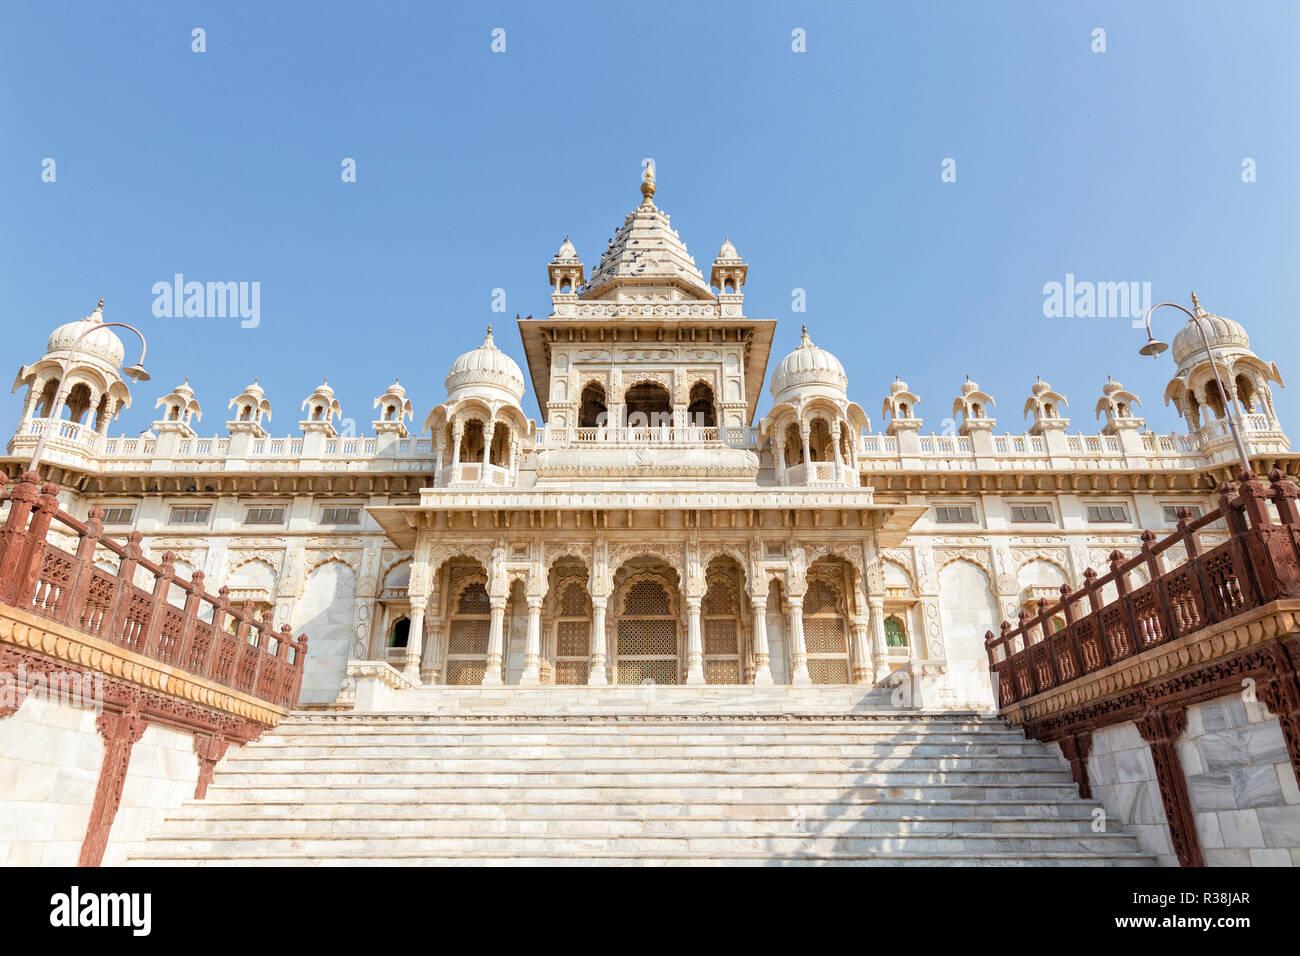 The Jaswant Thada Cenotaph in Jodhpur India Stock Photo